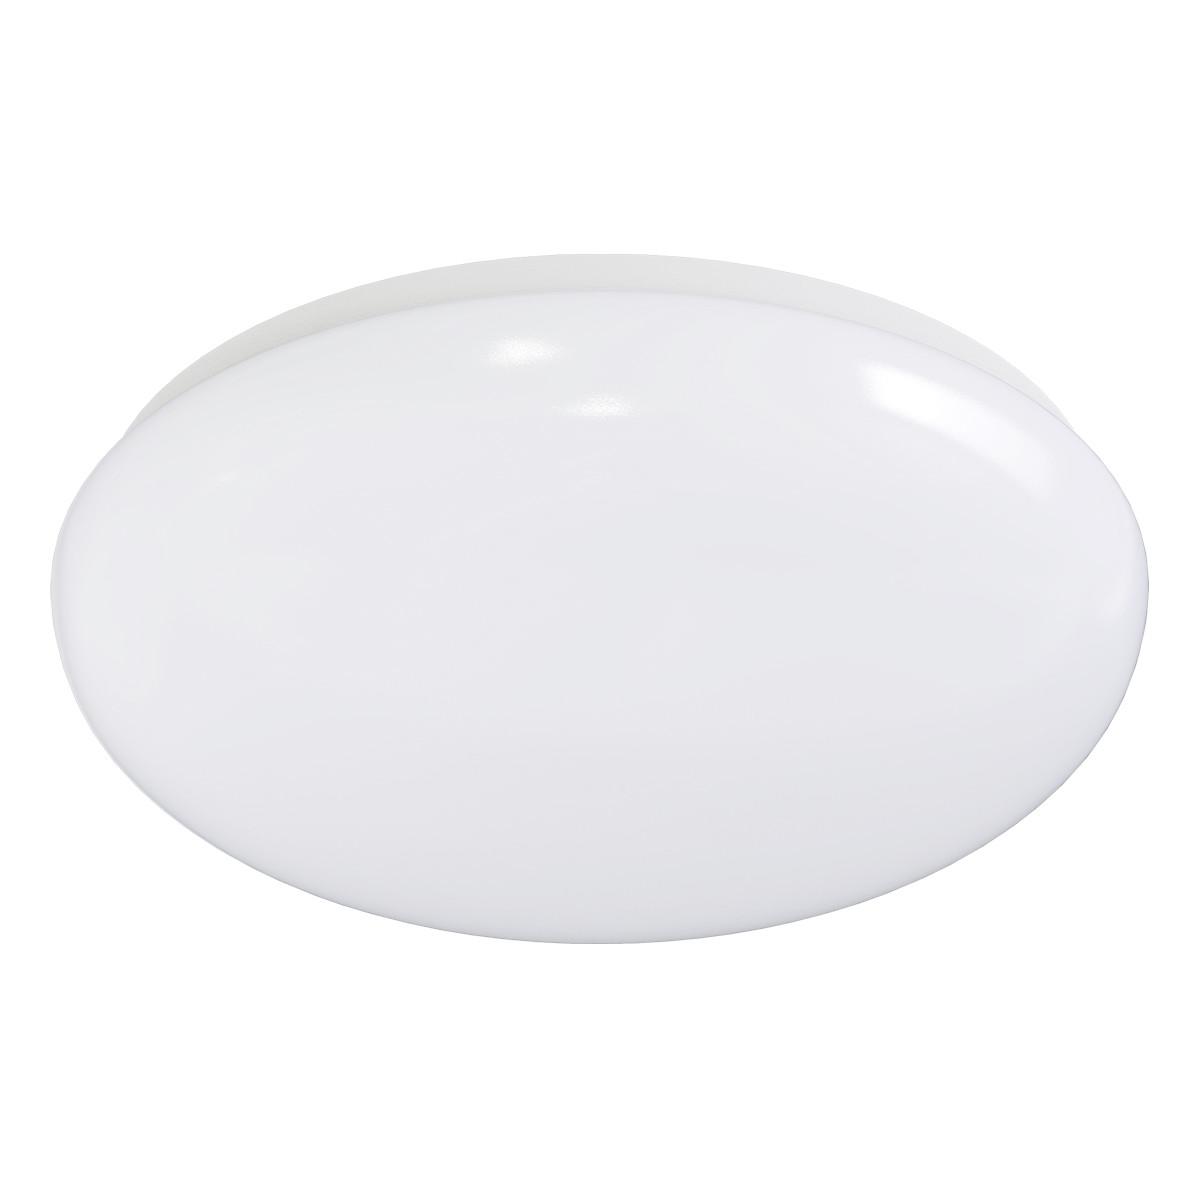 LED Plafondlamp met Bewegingssensor - Aigi - Opbouw Rond 12W - Helder/Koud Wit 6500K - 360° - Mat Wi